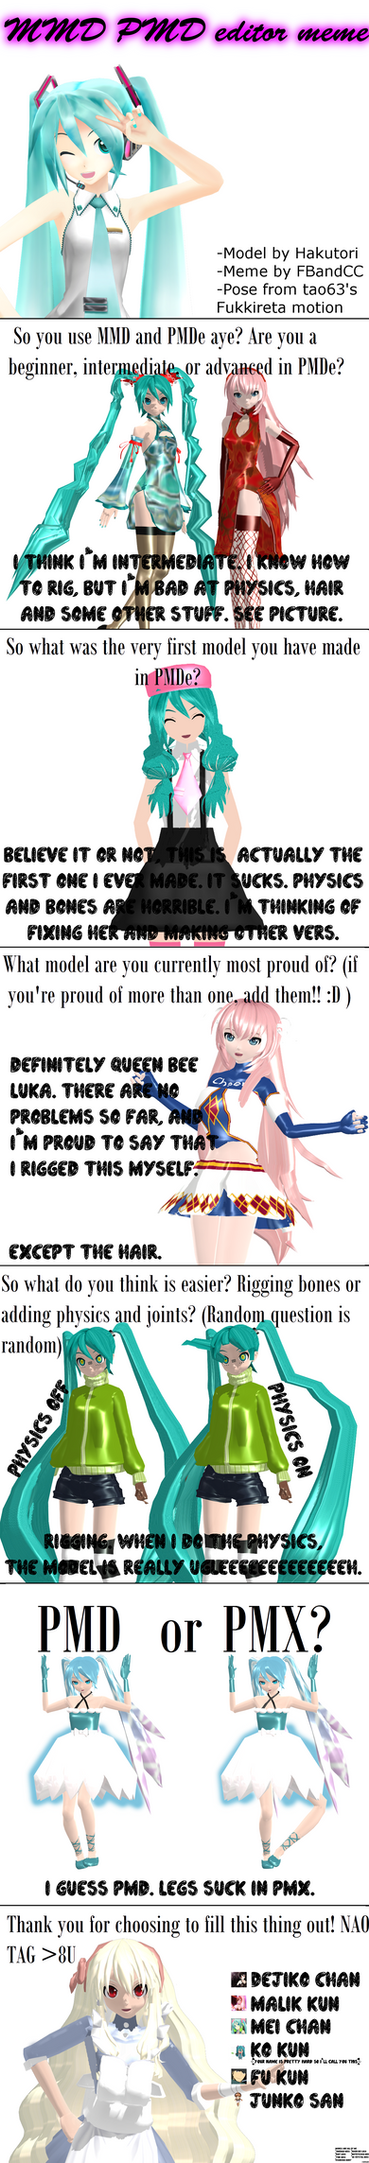 PMDe/PMXe Meme by megpoid625